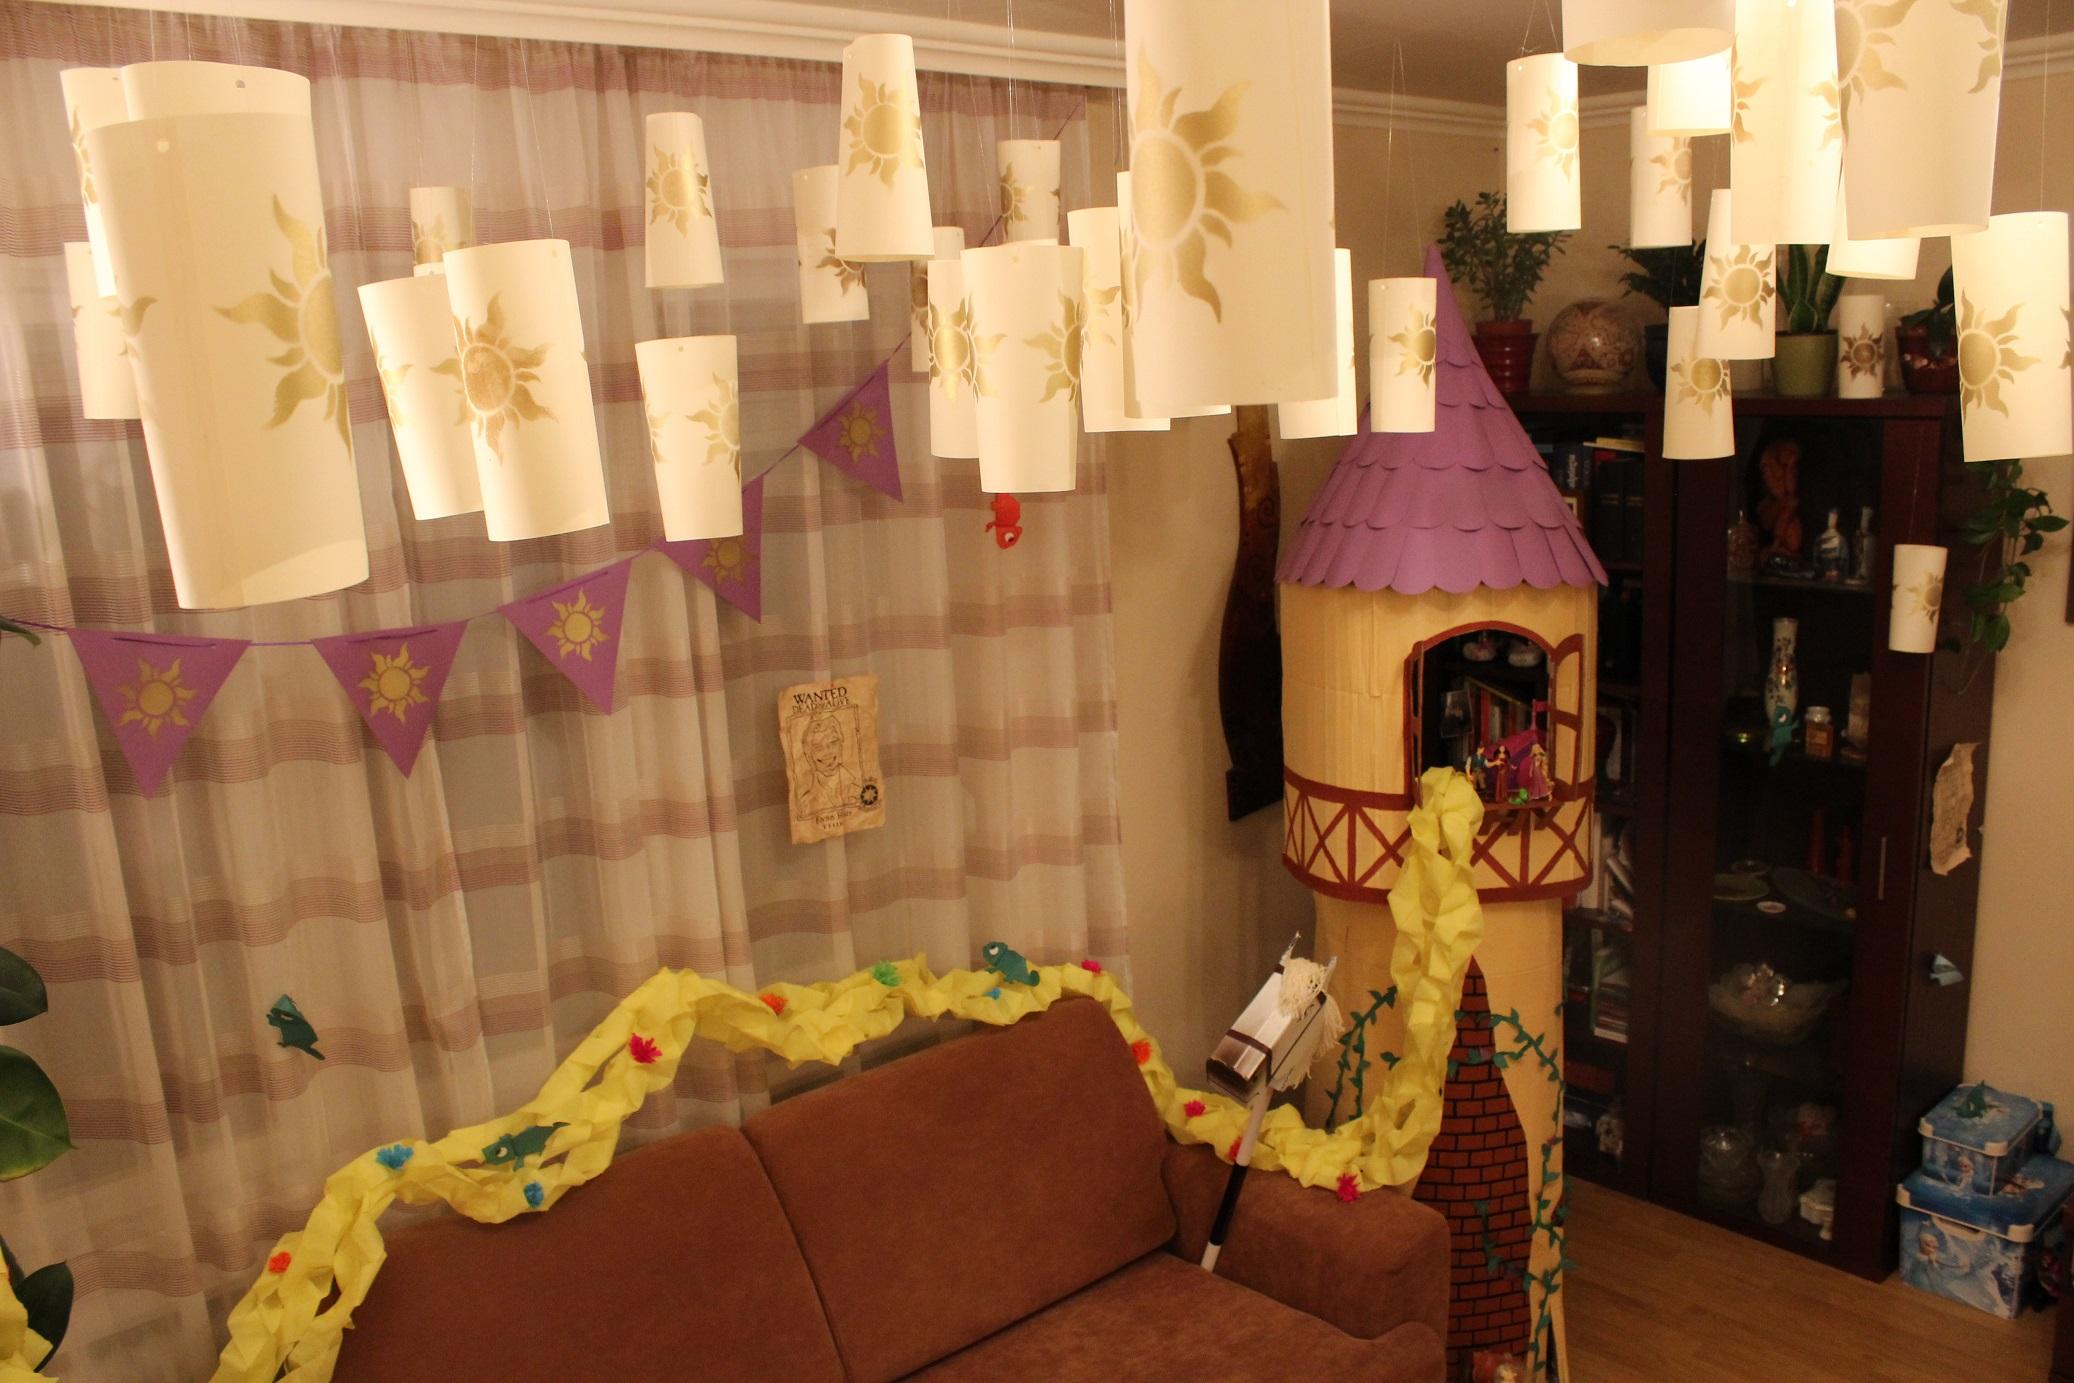 szmk_tangled_aranyhaj_birthday_party_szulinap_dekor_buli_19.JPG